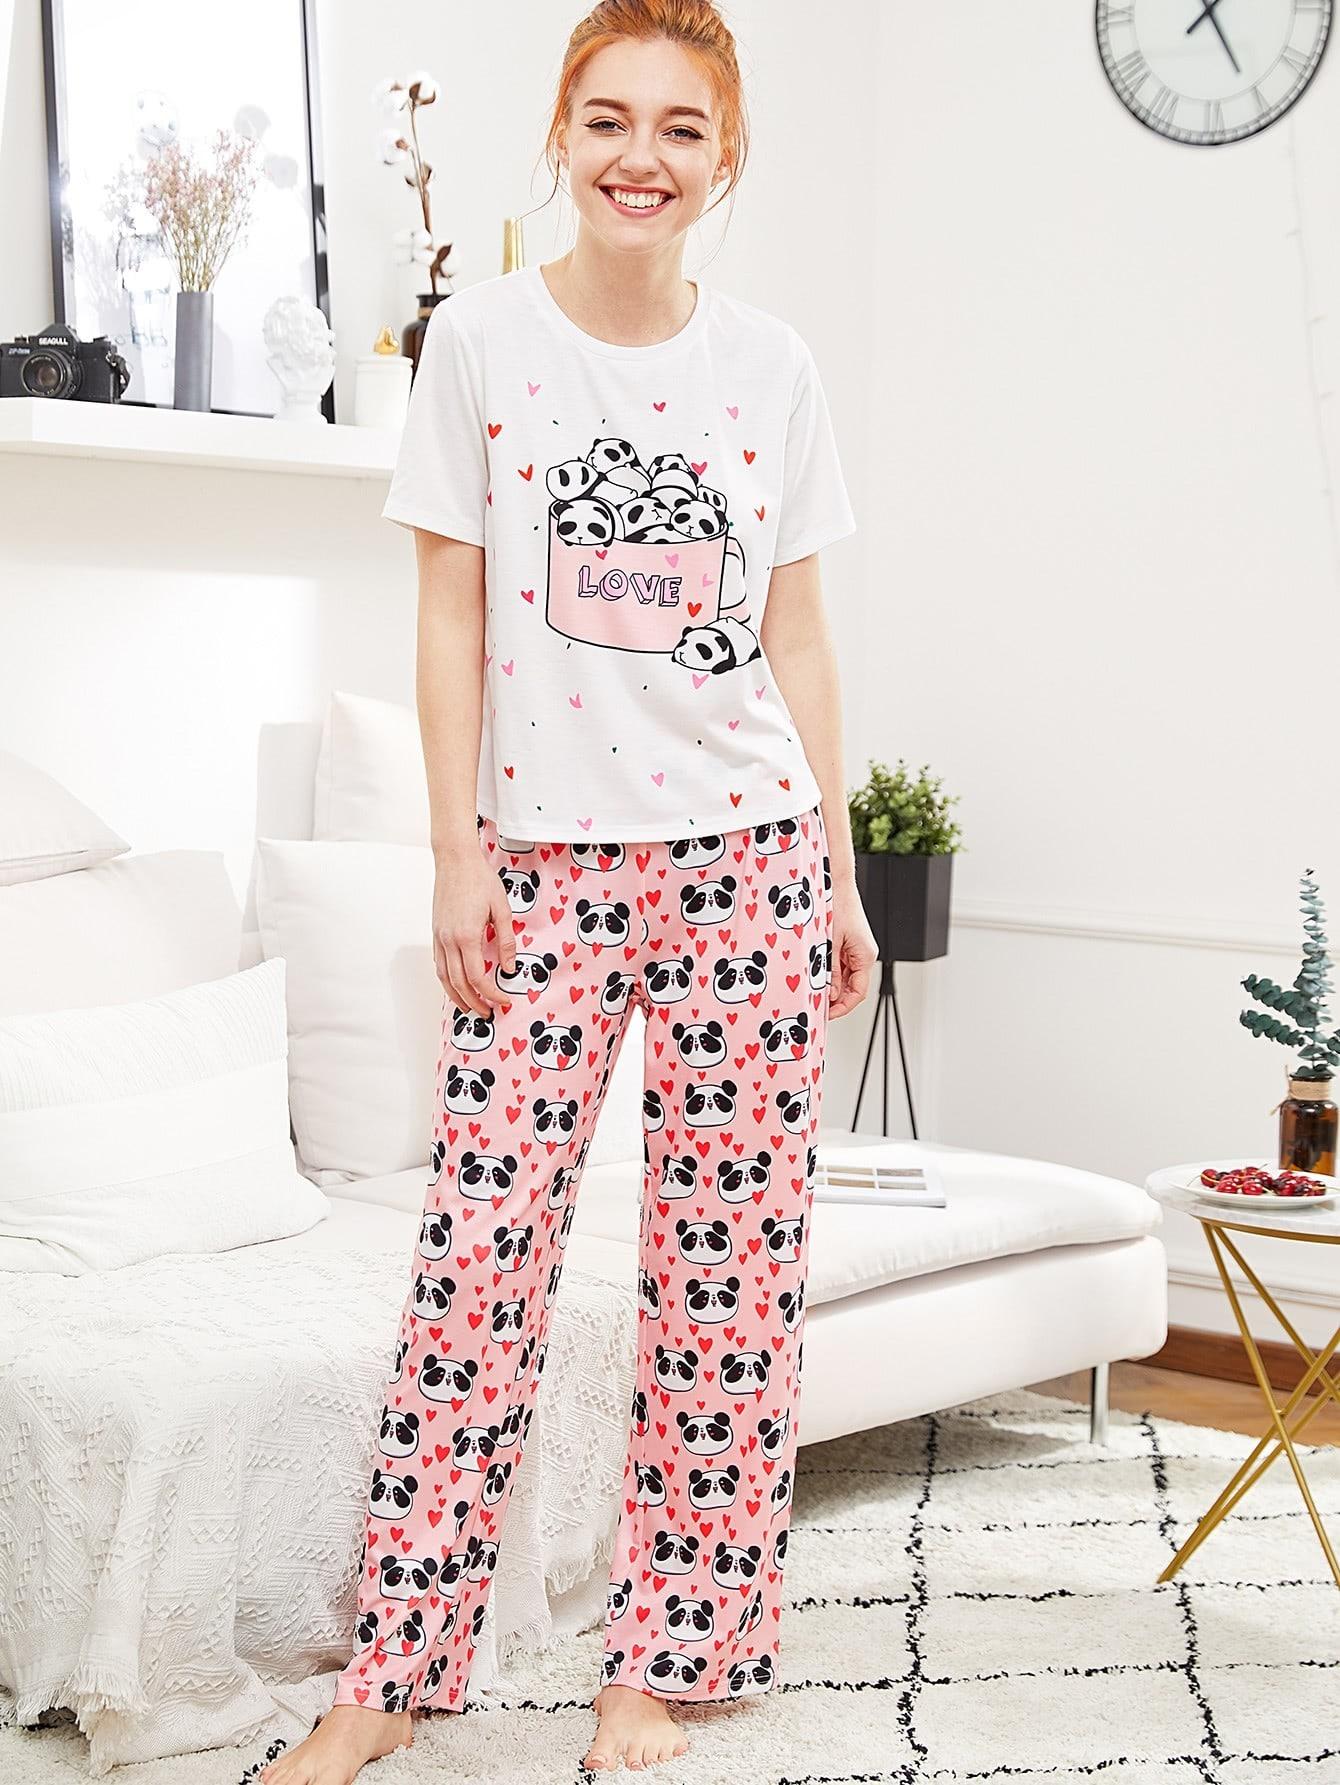 Panda And Heart Print Tee & Pants PJ Set dog print tee and floral pants pj set